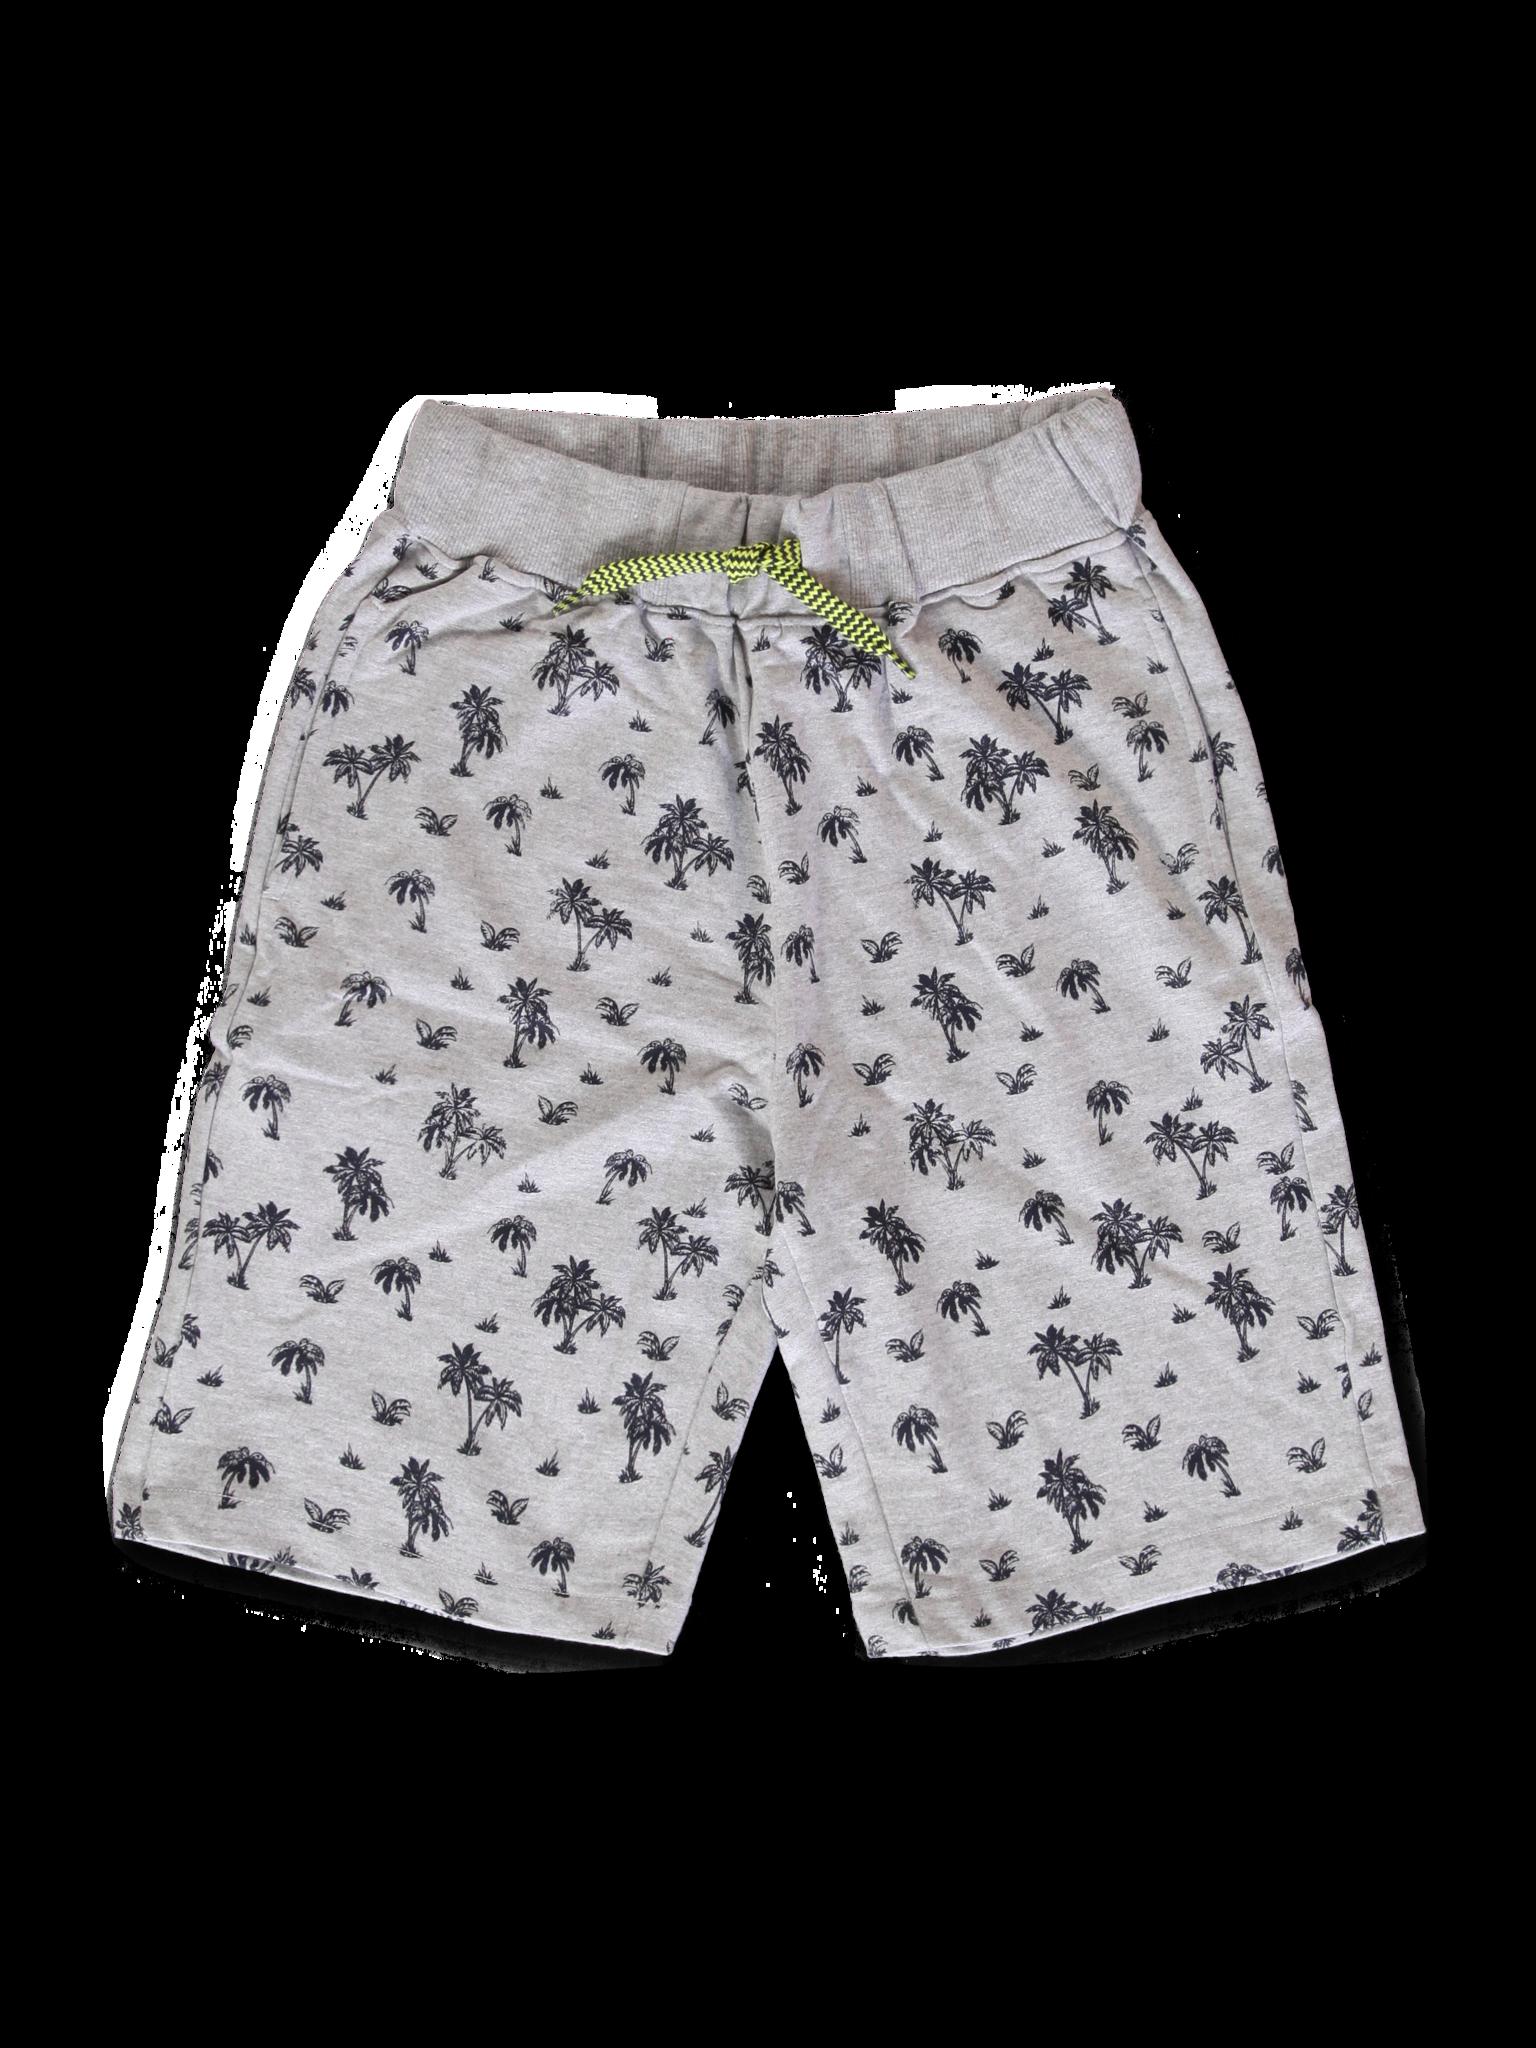 All Brands | Summerproducts Teen Boys | Bermuda | 12 pcs/box